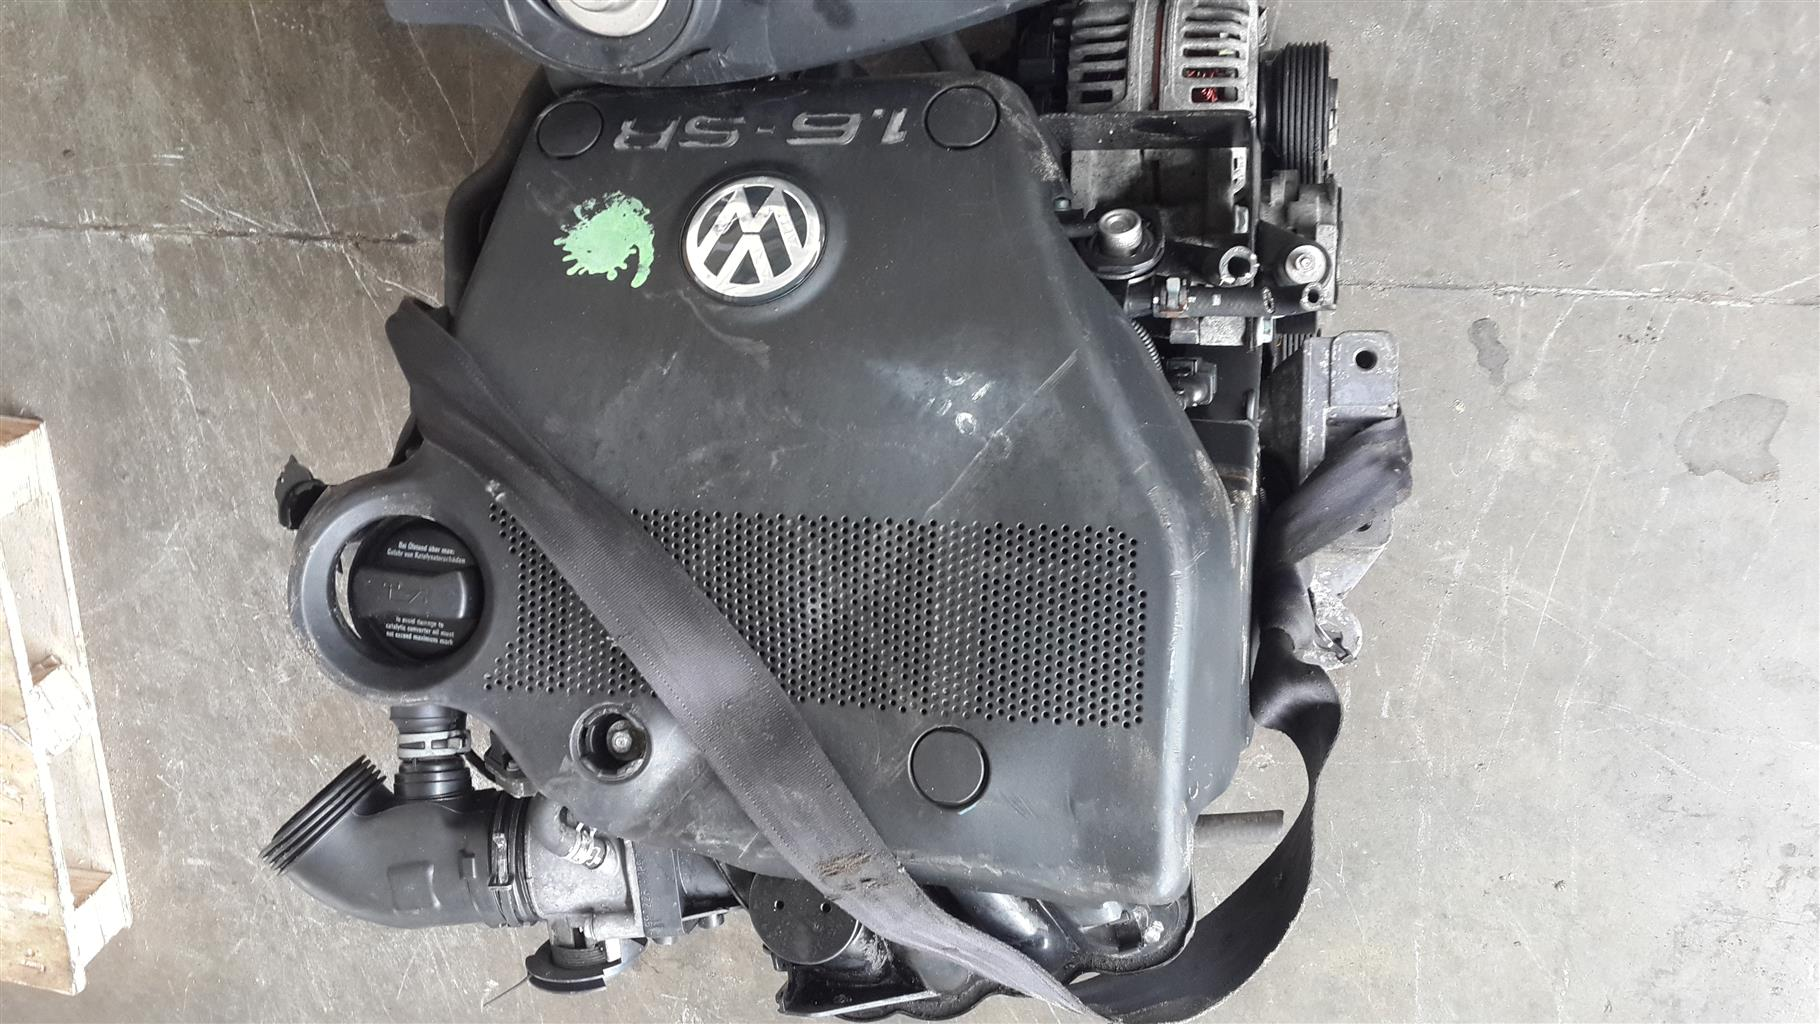 Vw Engines For Sale >> Vw Golf 4 1 6 Engine For Sale